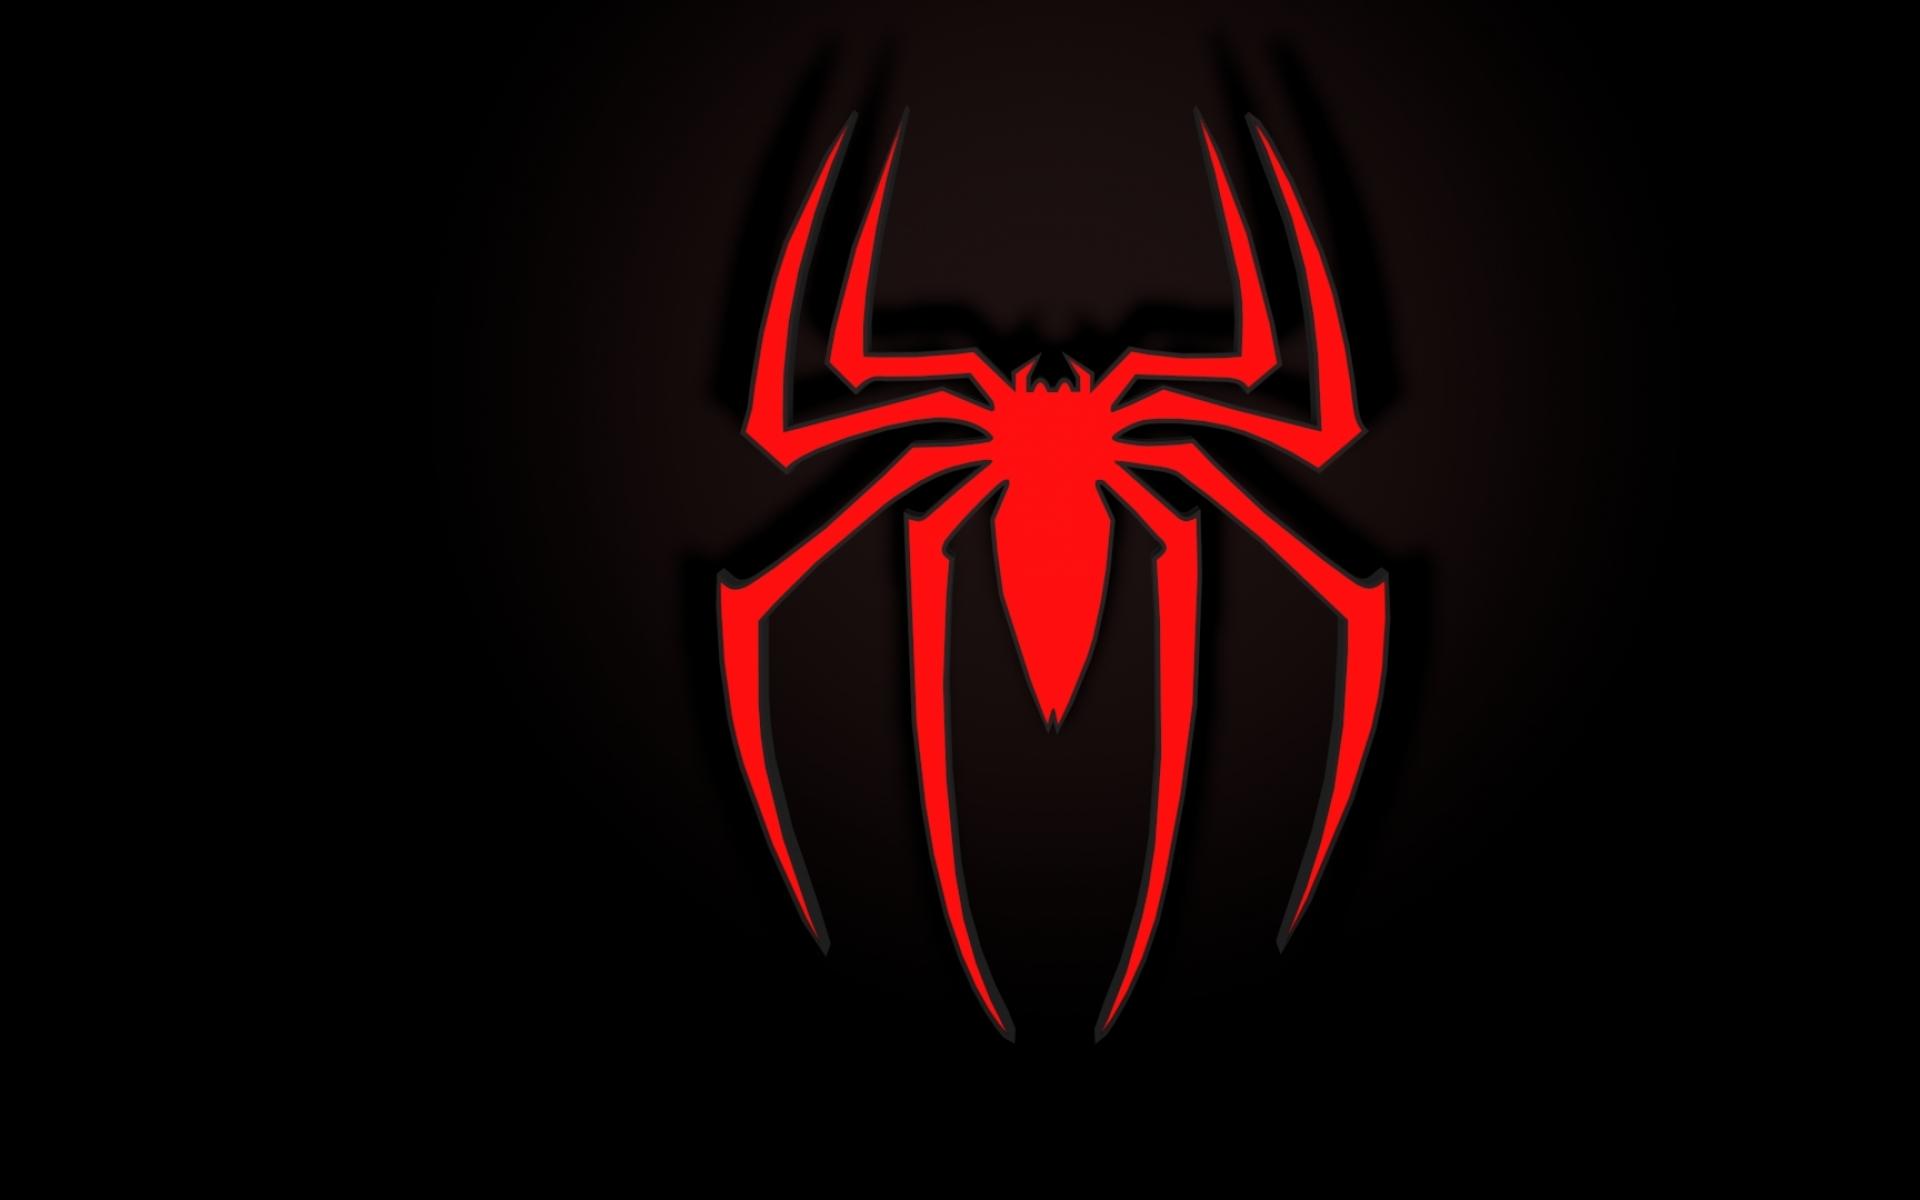 red spiderman spiders 1920x1080 wallpaper Art HD Wallpaper download 1920x1200